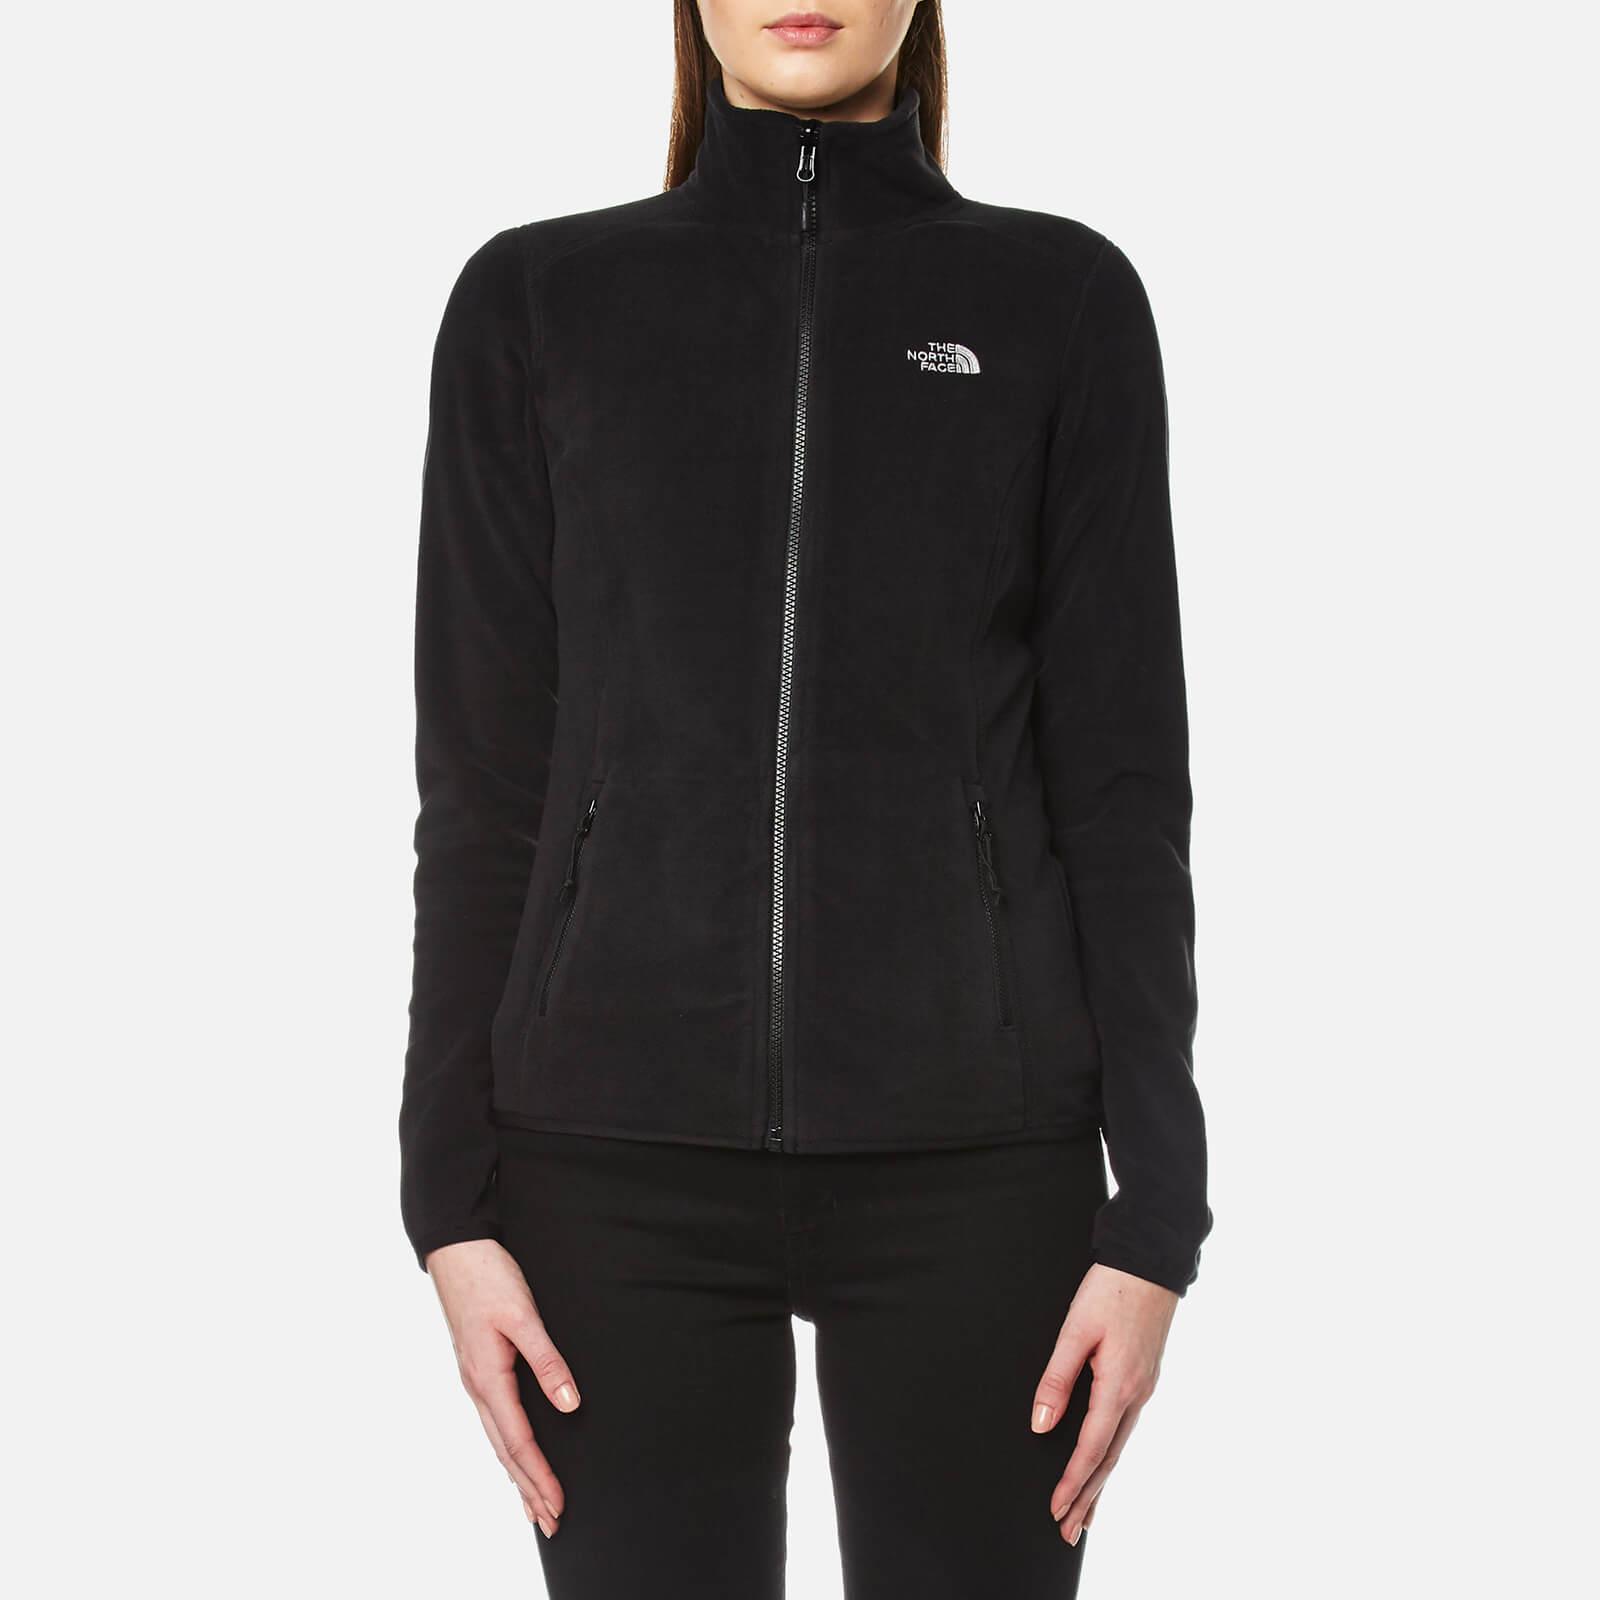 The North Face Women's 100 Glacier Full Zip Fleece - TNF Black - M - Black